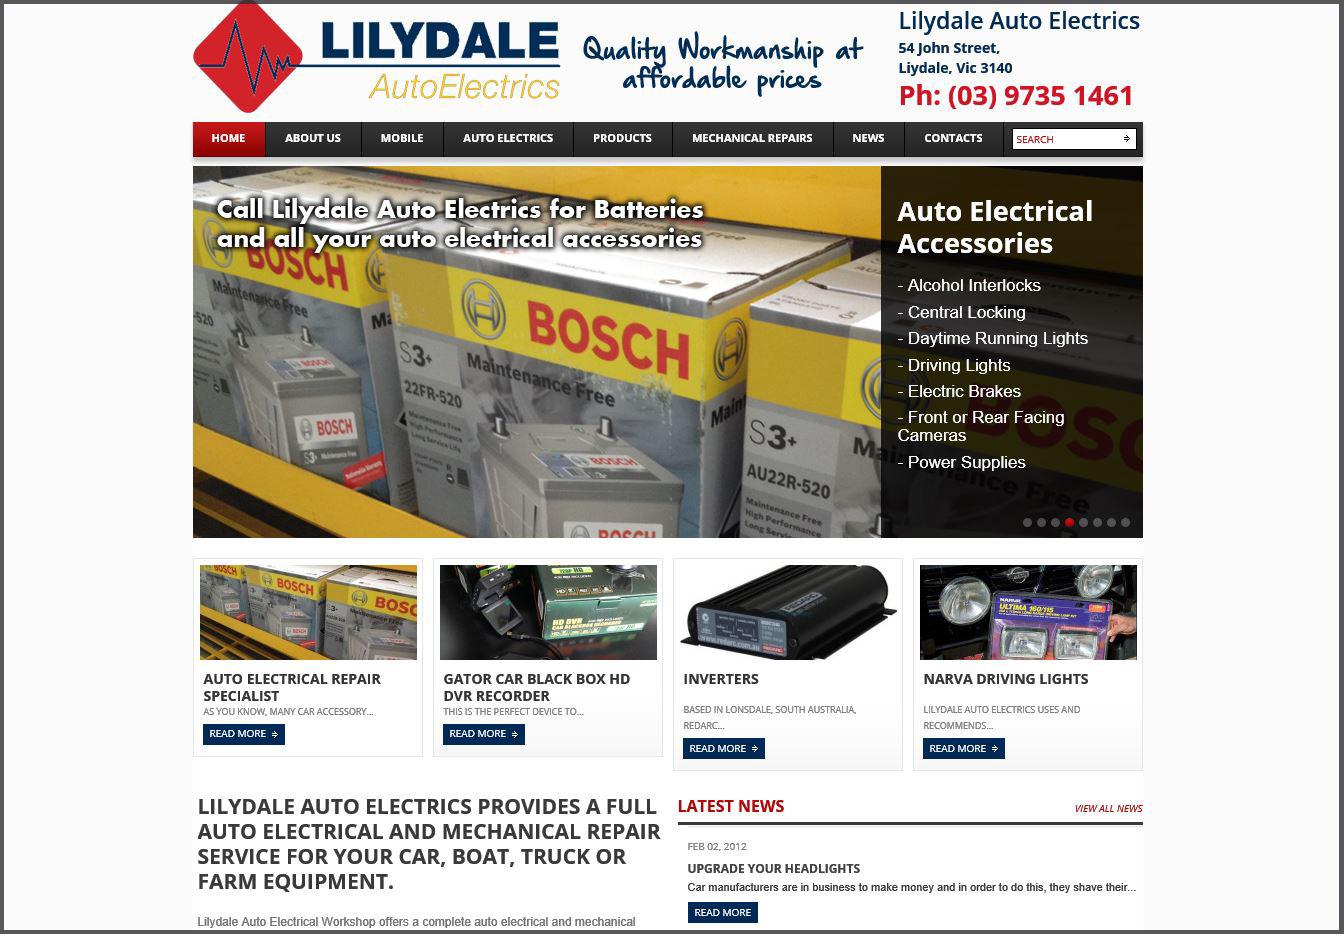 371913-Lilydale Auto Electrics website